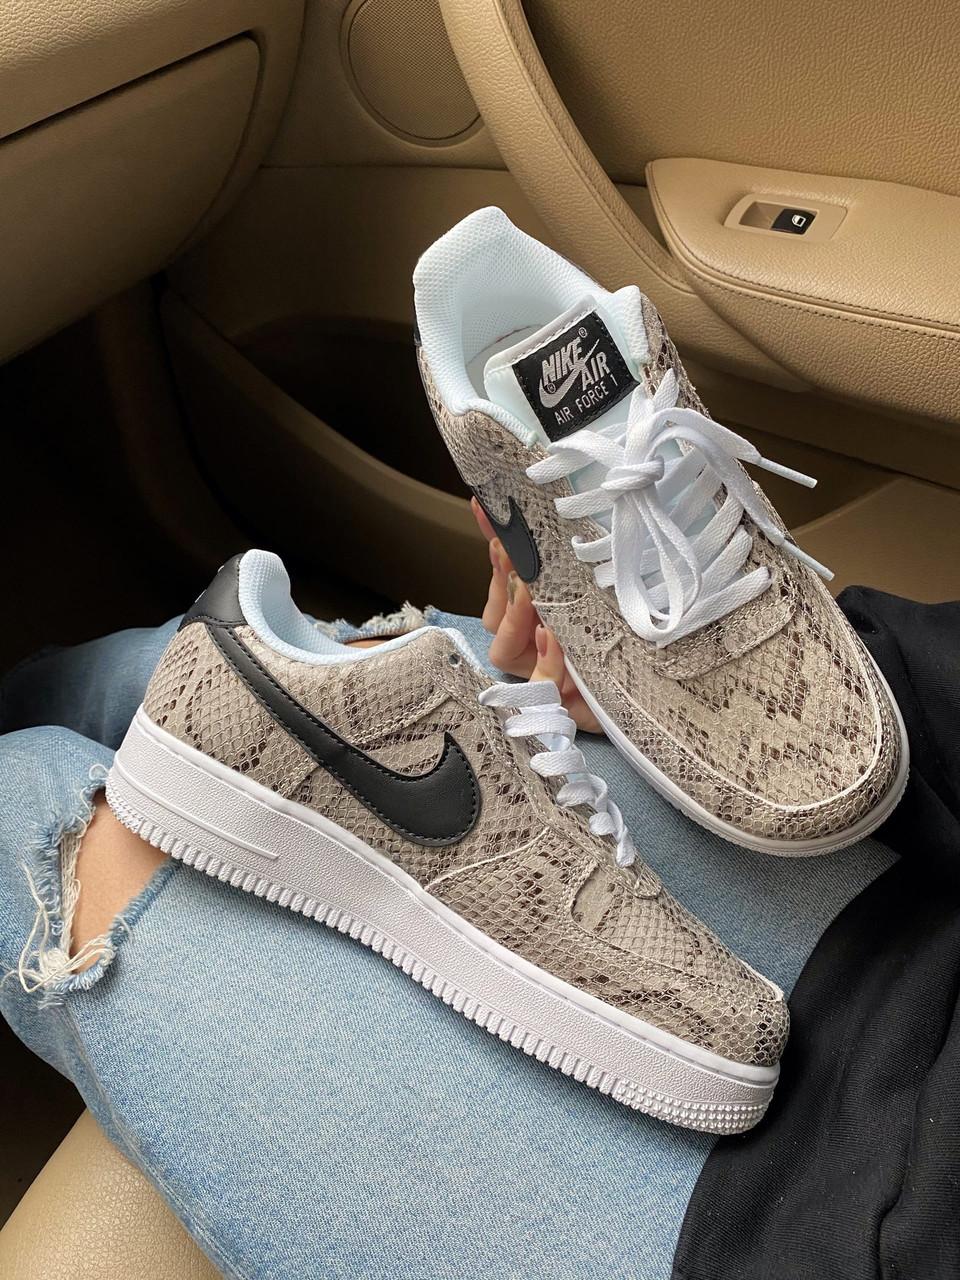 Стильные кроссовки Nike Air Force 1 Low Snakeskin